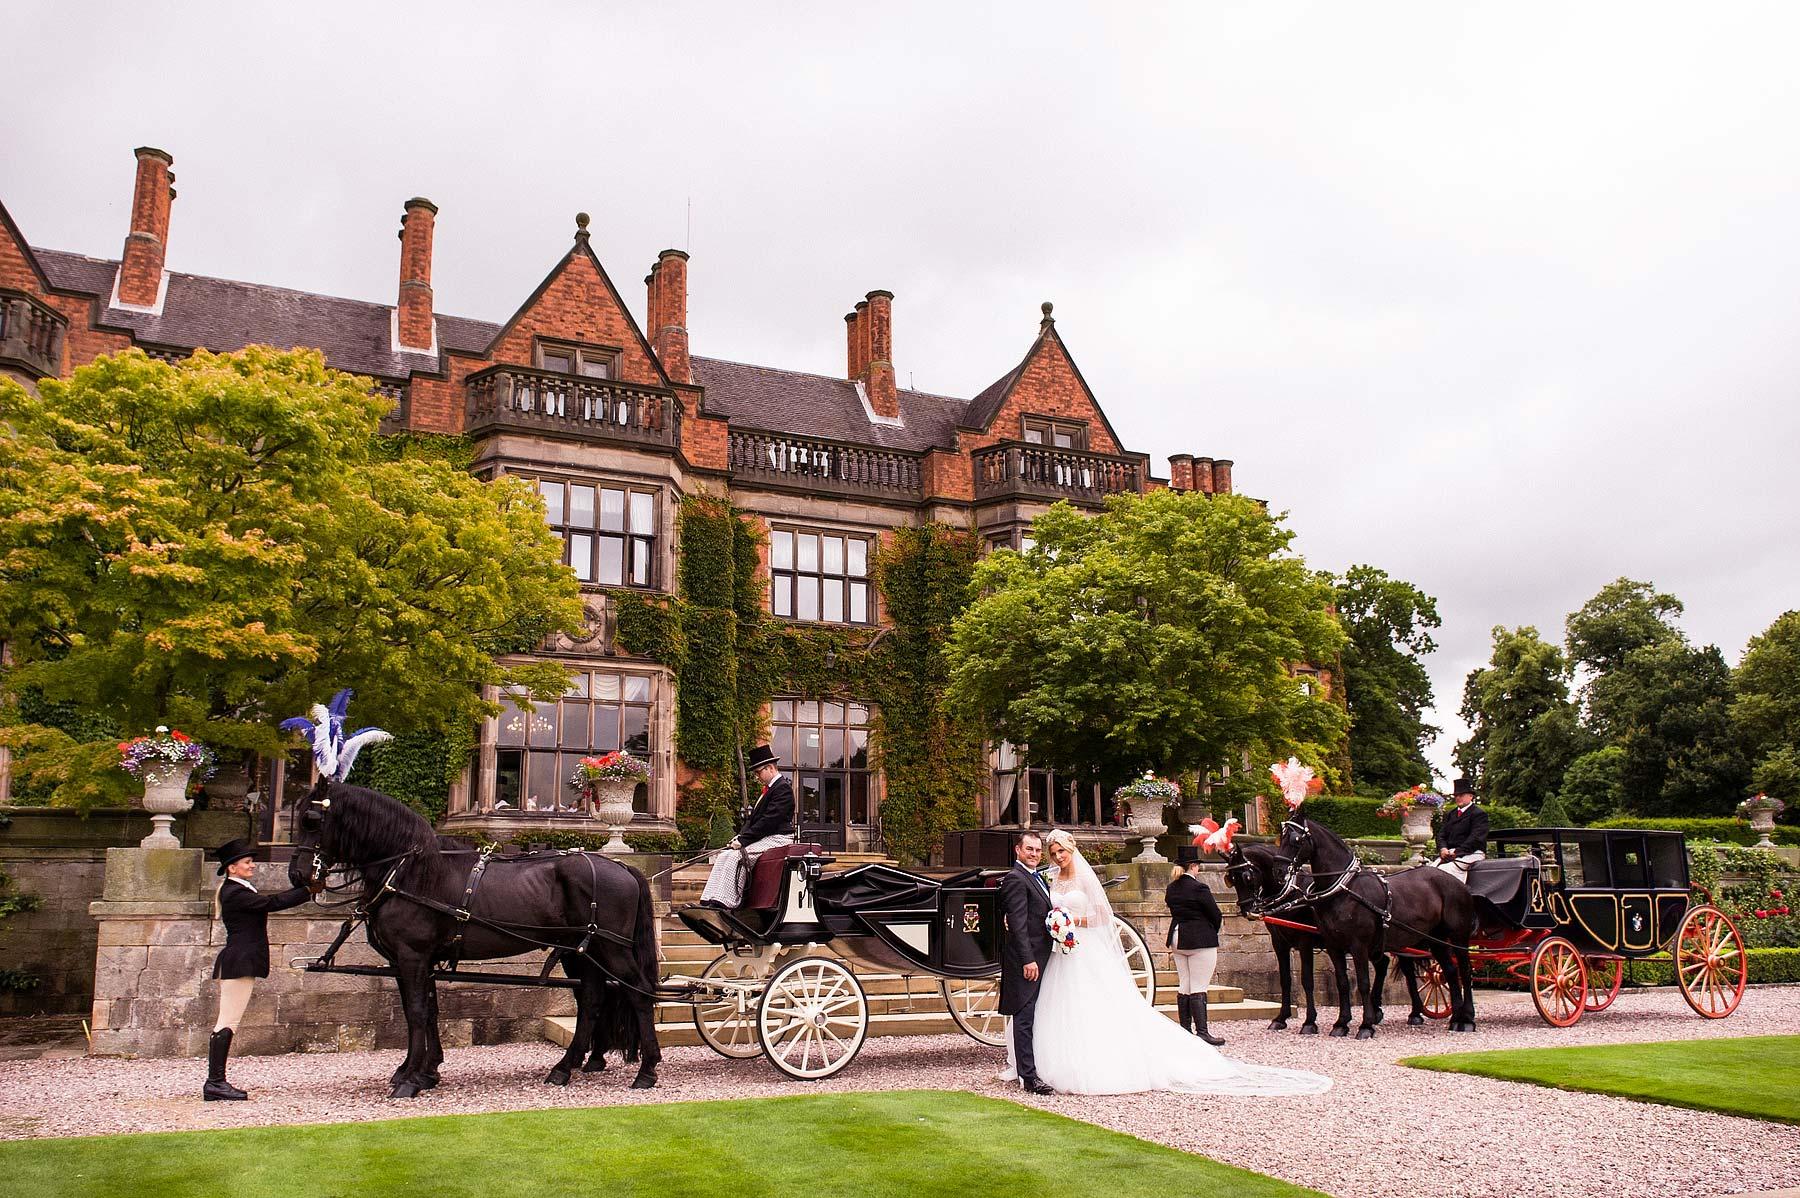 hoar-cross-hall-wedding-photographers-060